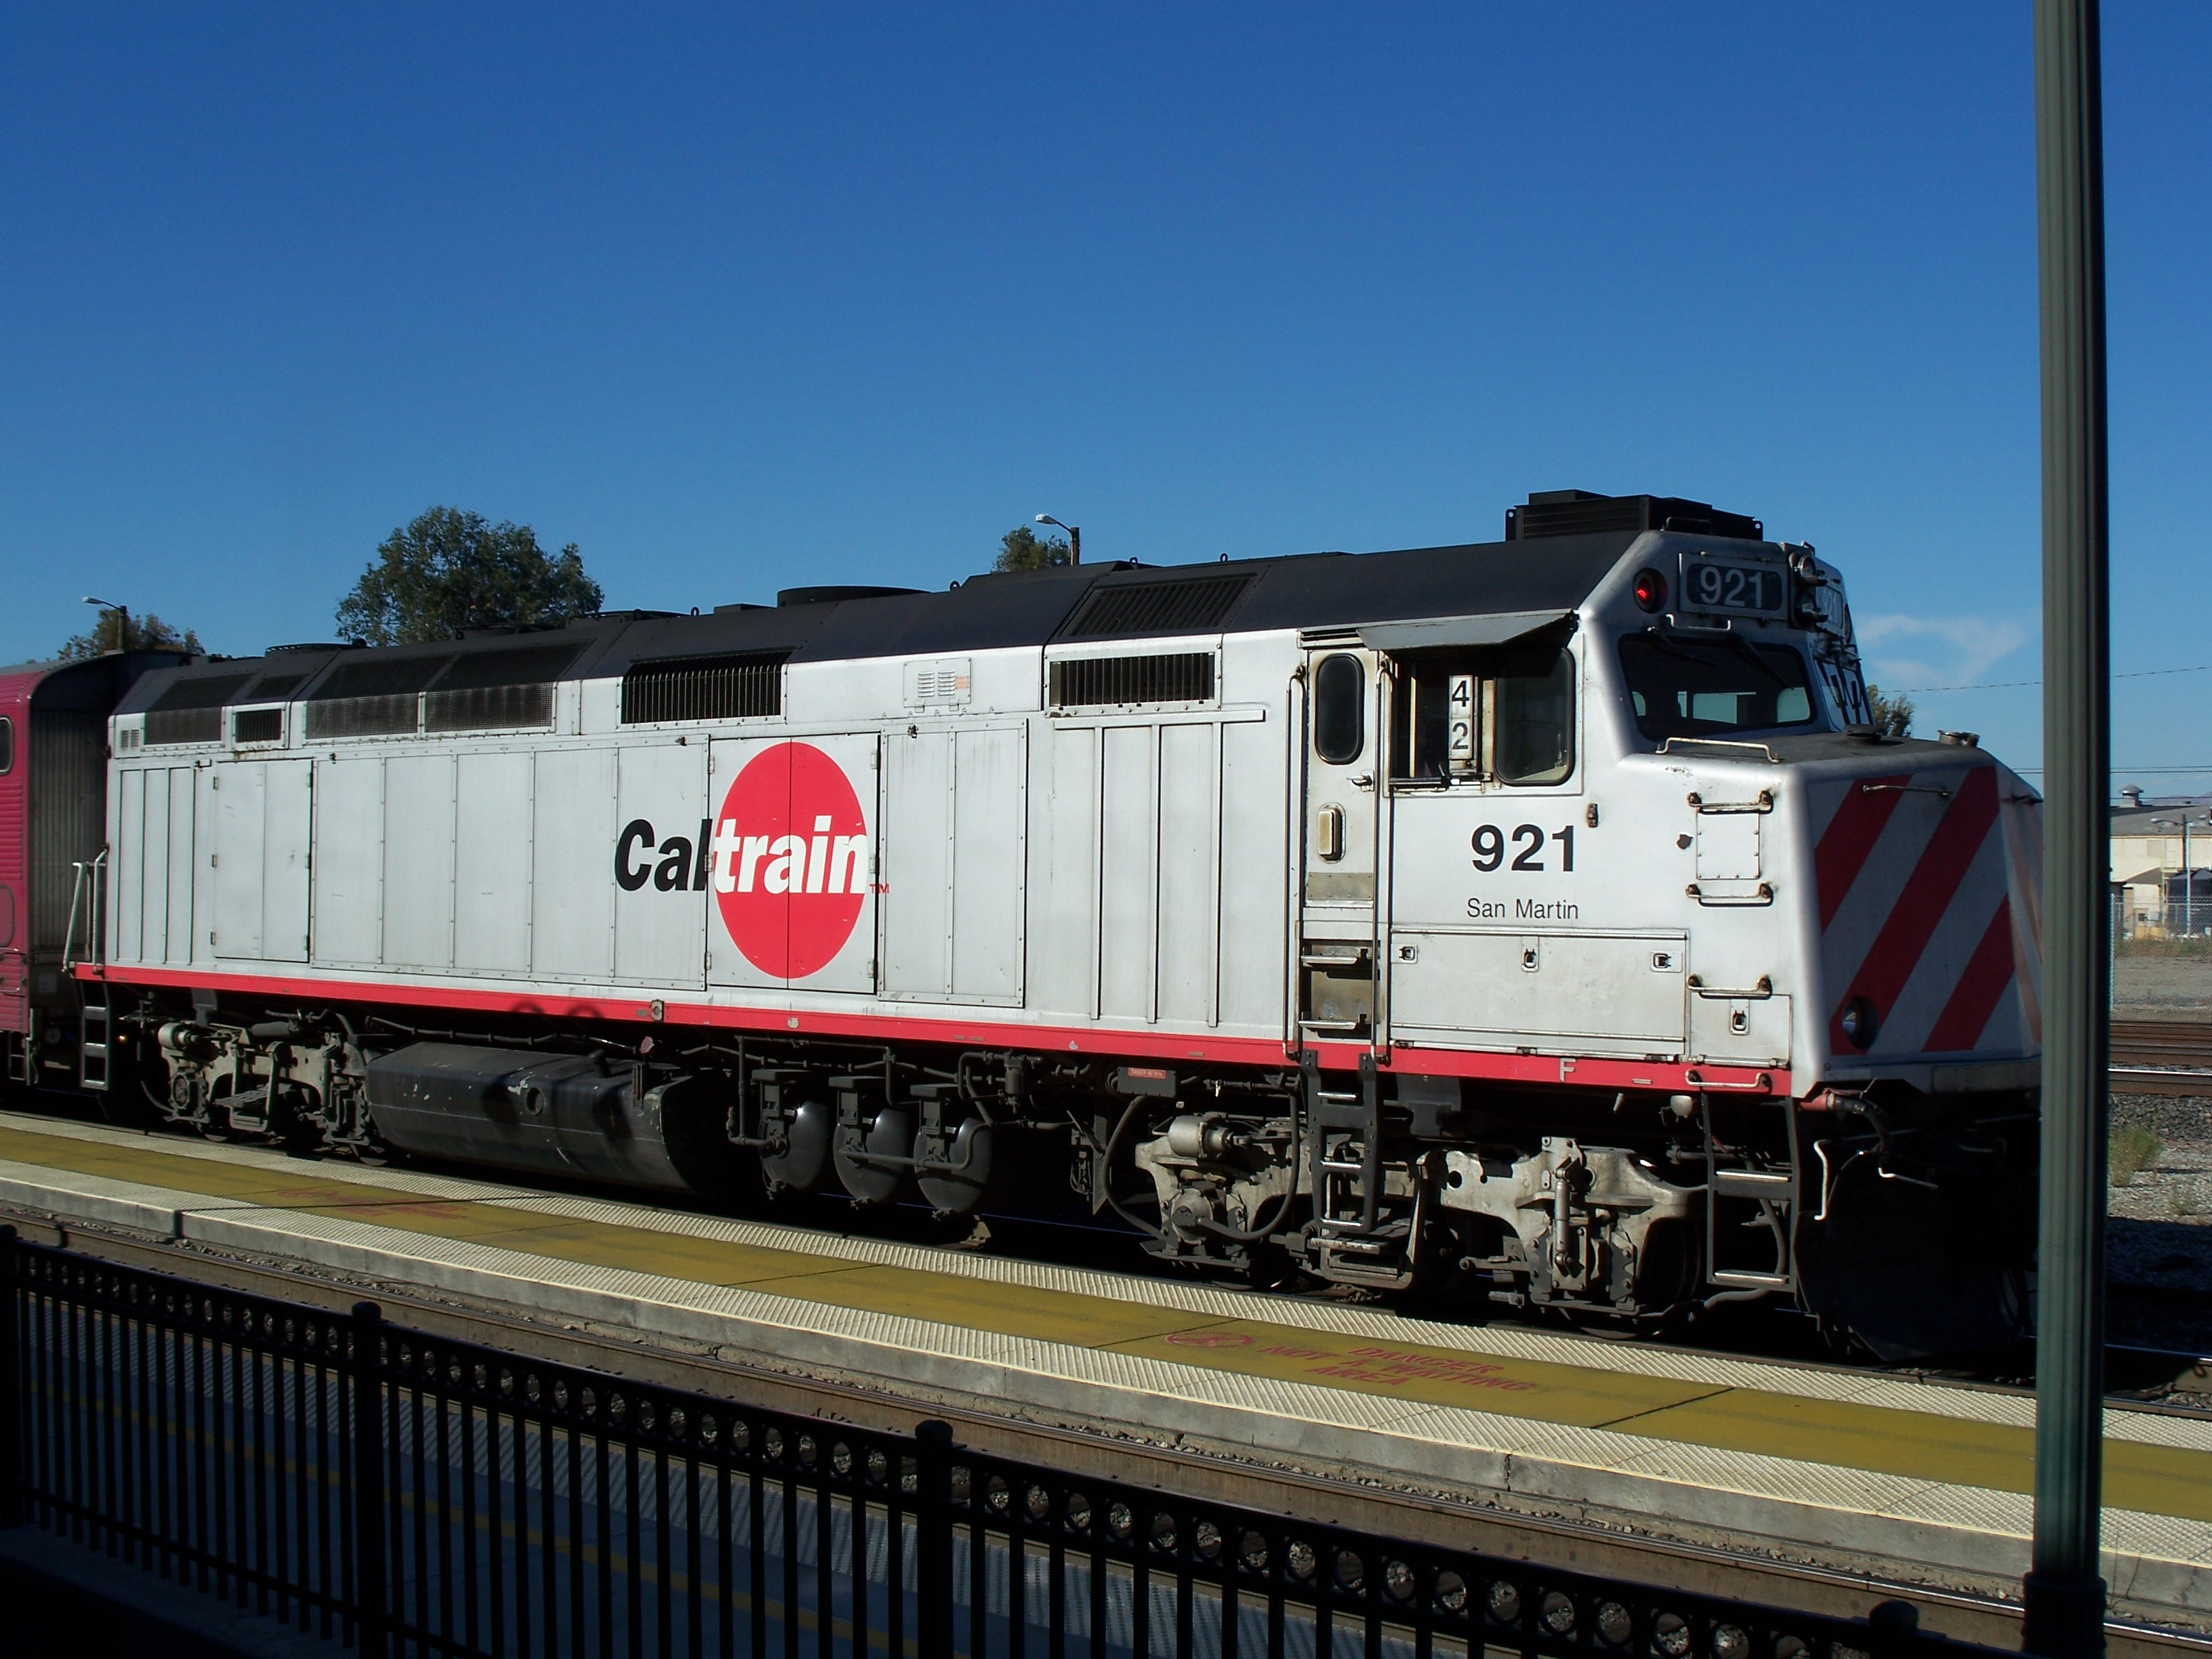 The Commuter >> File:Caltrain-Diesel Locomotive 921.jpg - Wikimedia Commons